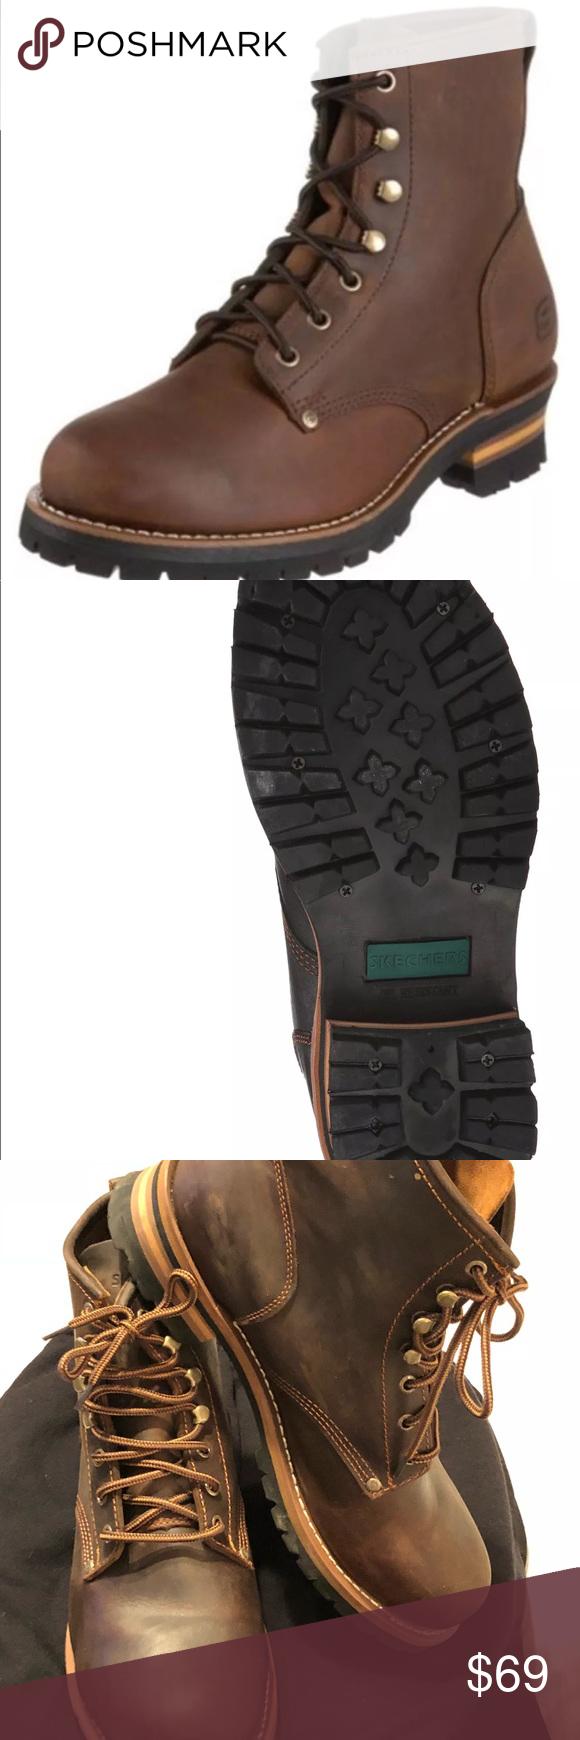 skechers oil resistant boots